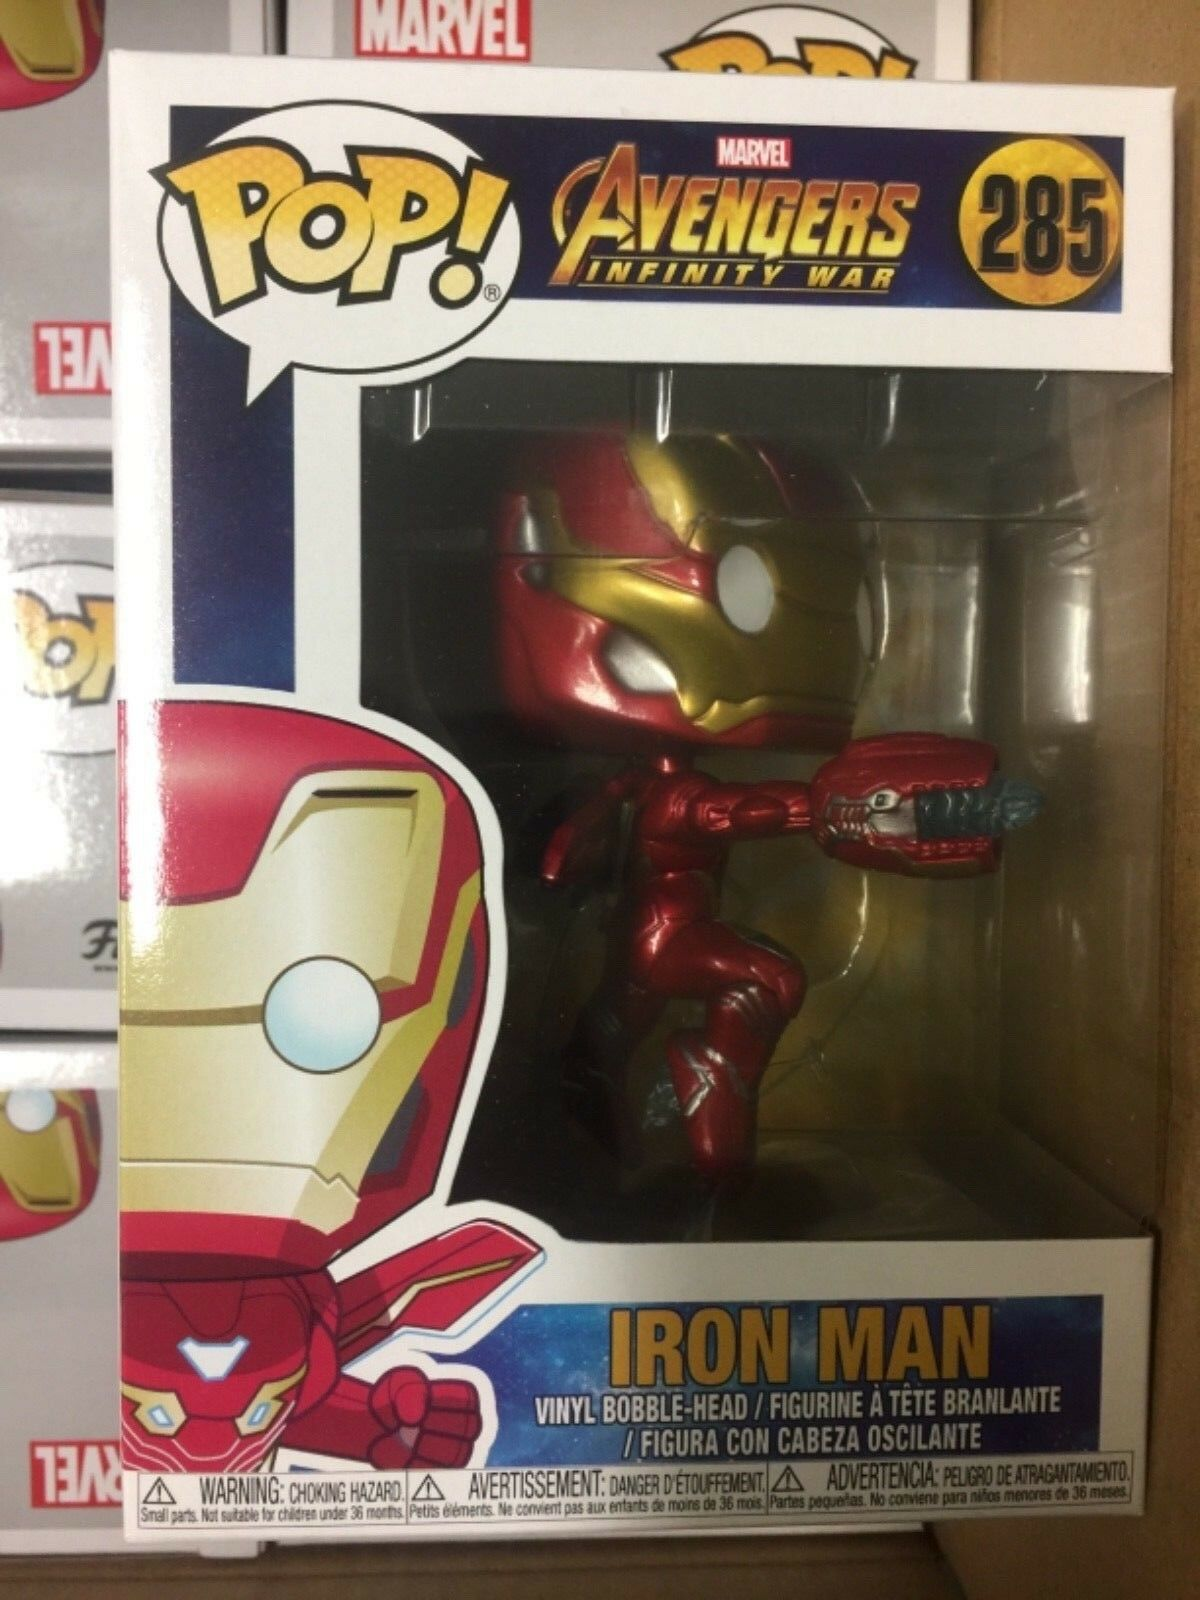 Marvel Avengers Infinity War IRON MAN #285 Vinyl Figure Legends 2018 Funko POP